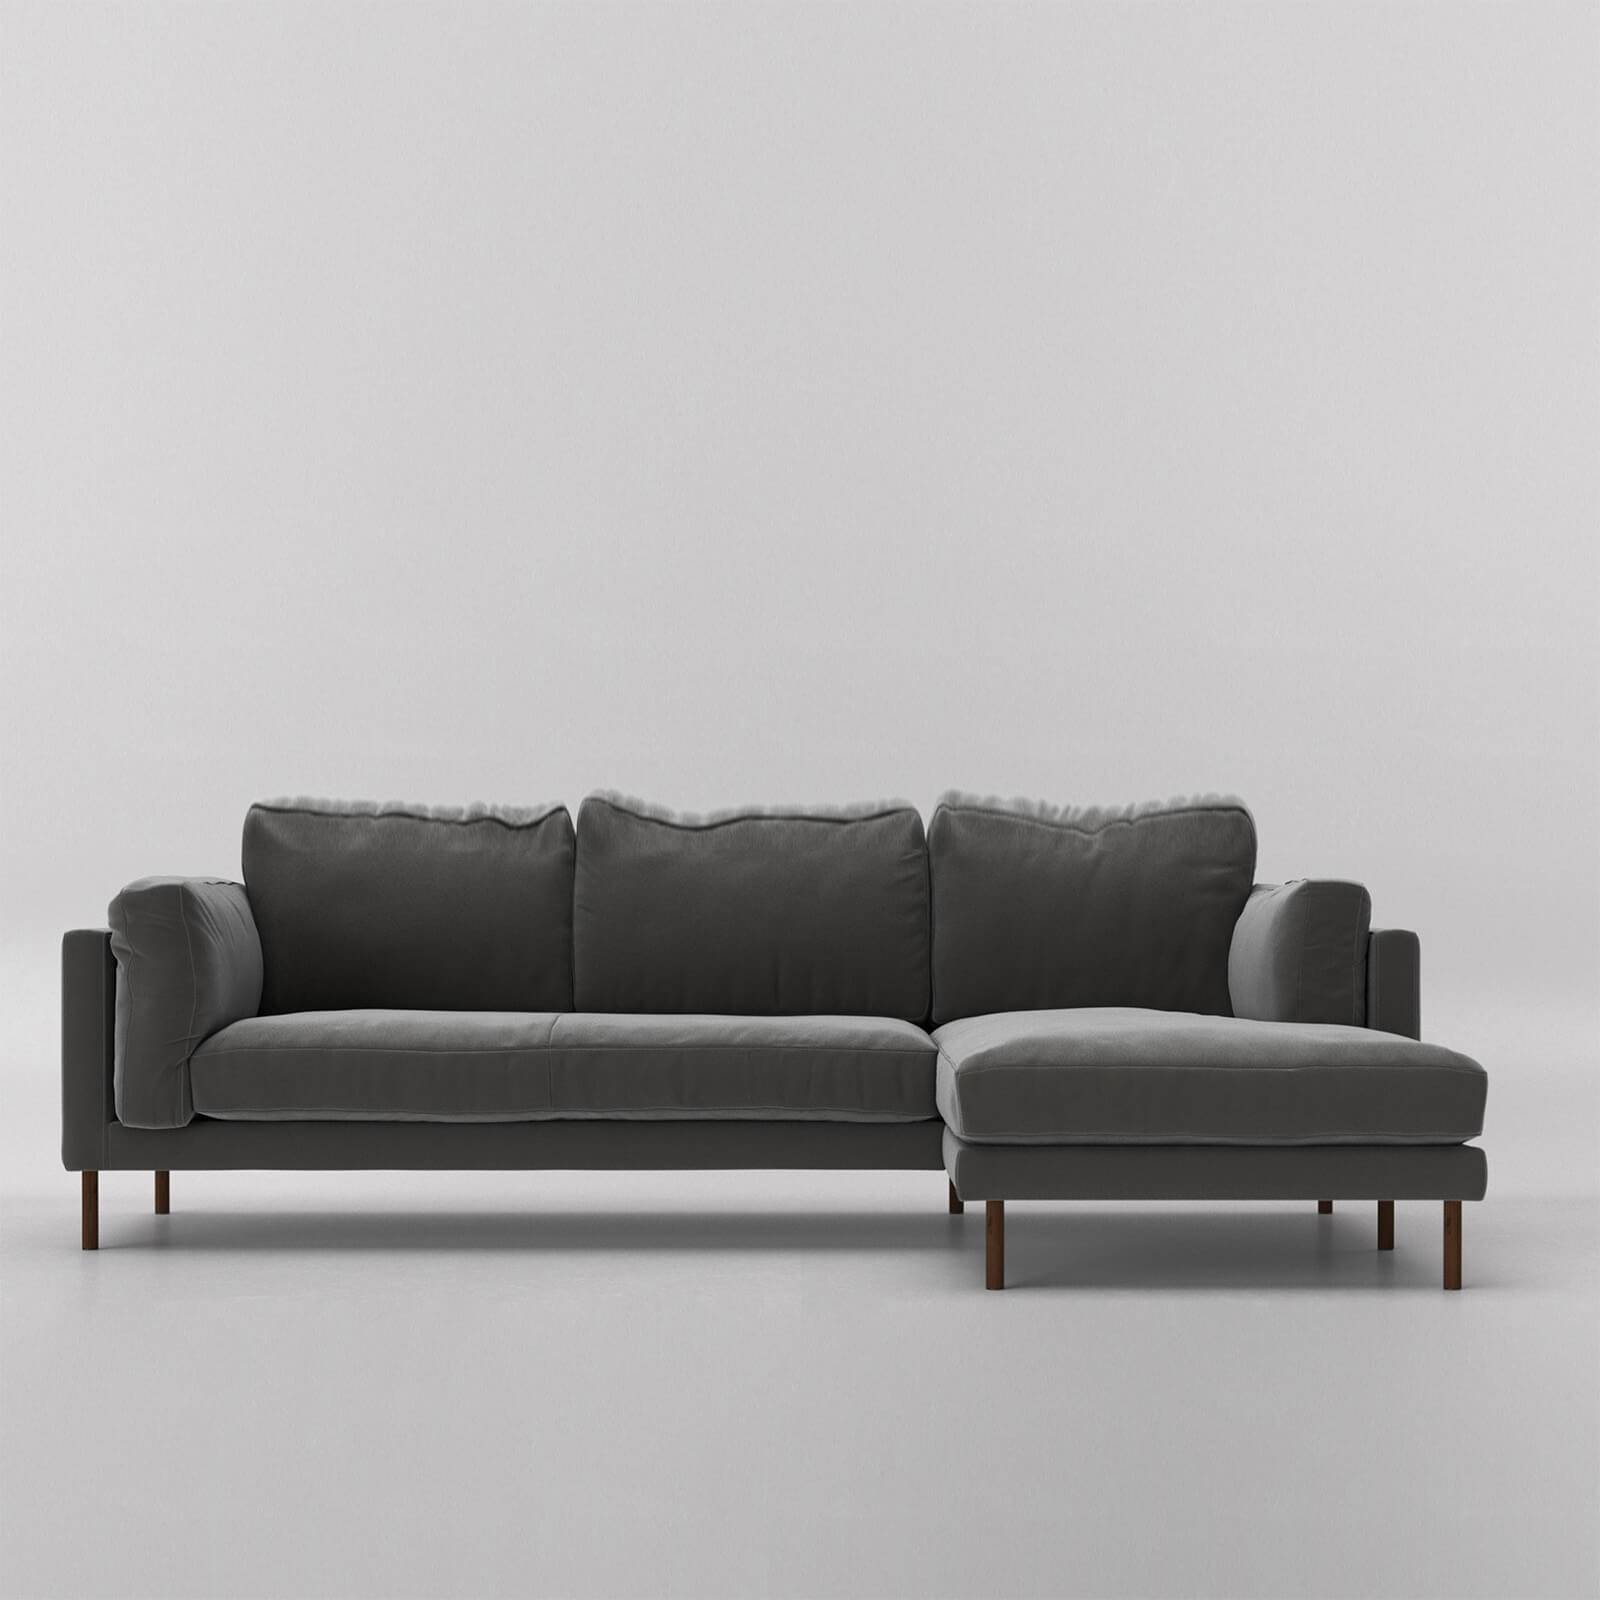 Swoon Munich Velvet Corner Sofa - Right Hand Side - Corner Sofa - Granite